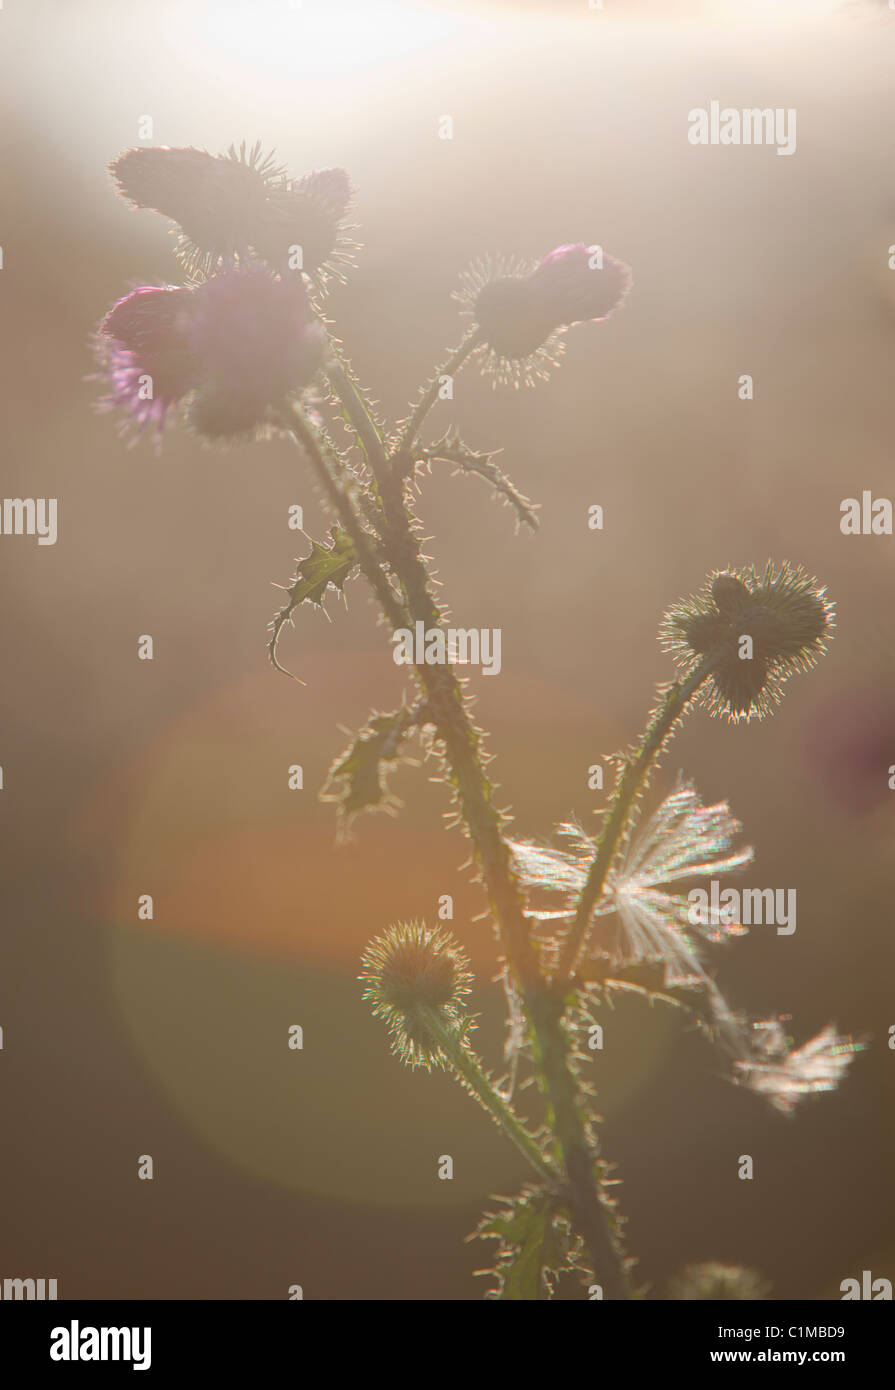 Silhouette of propagating burdock plant ( arctium ,  Asteraceae ) - Stock Image